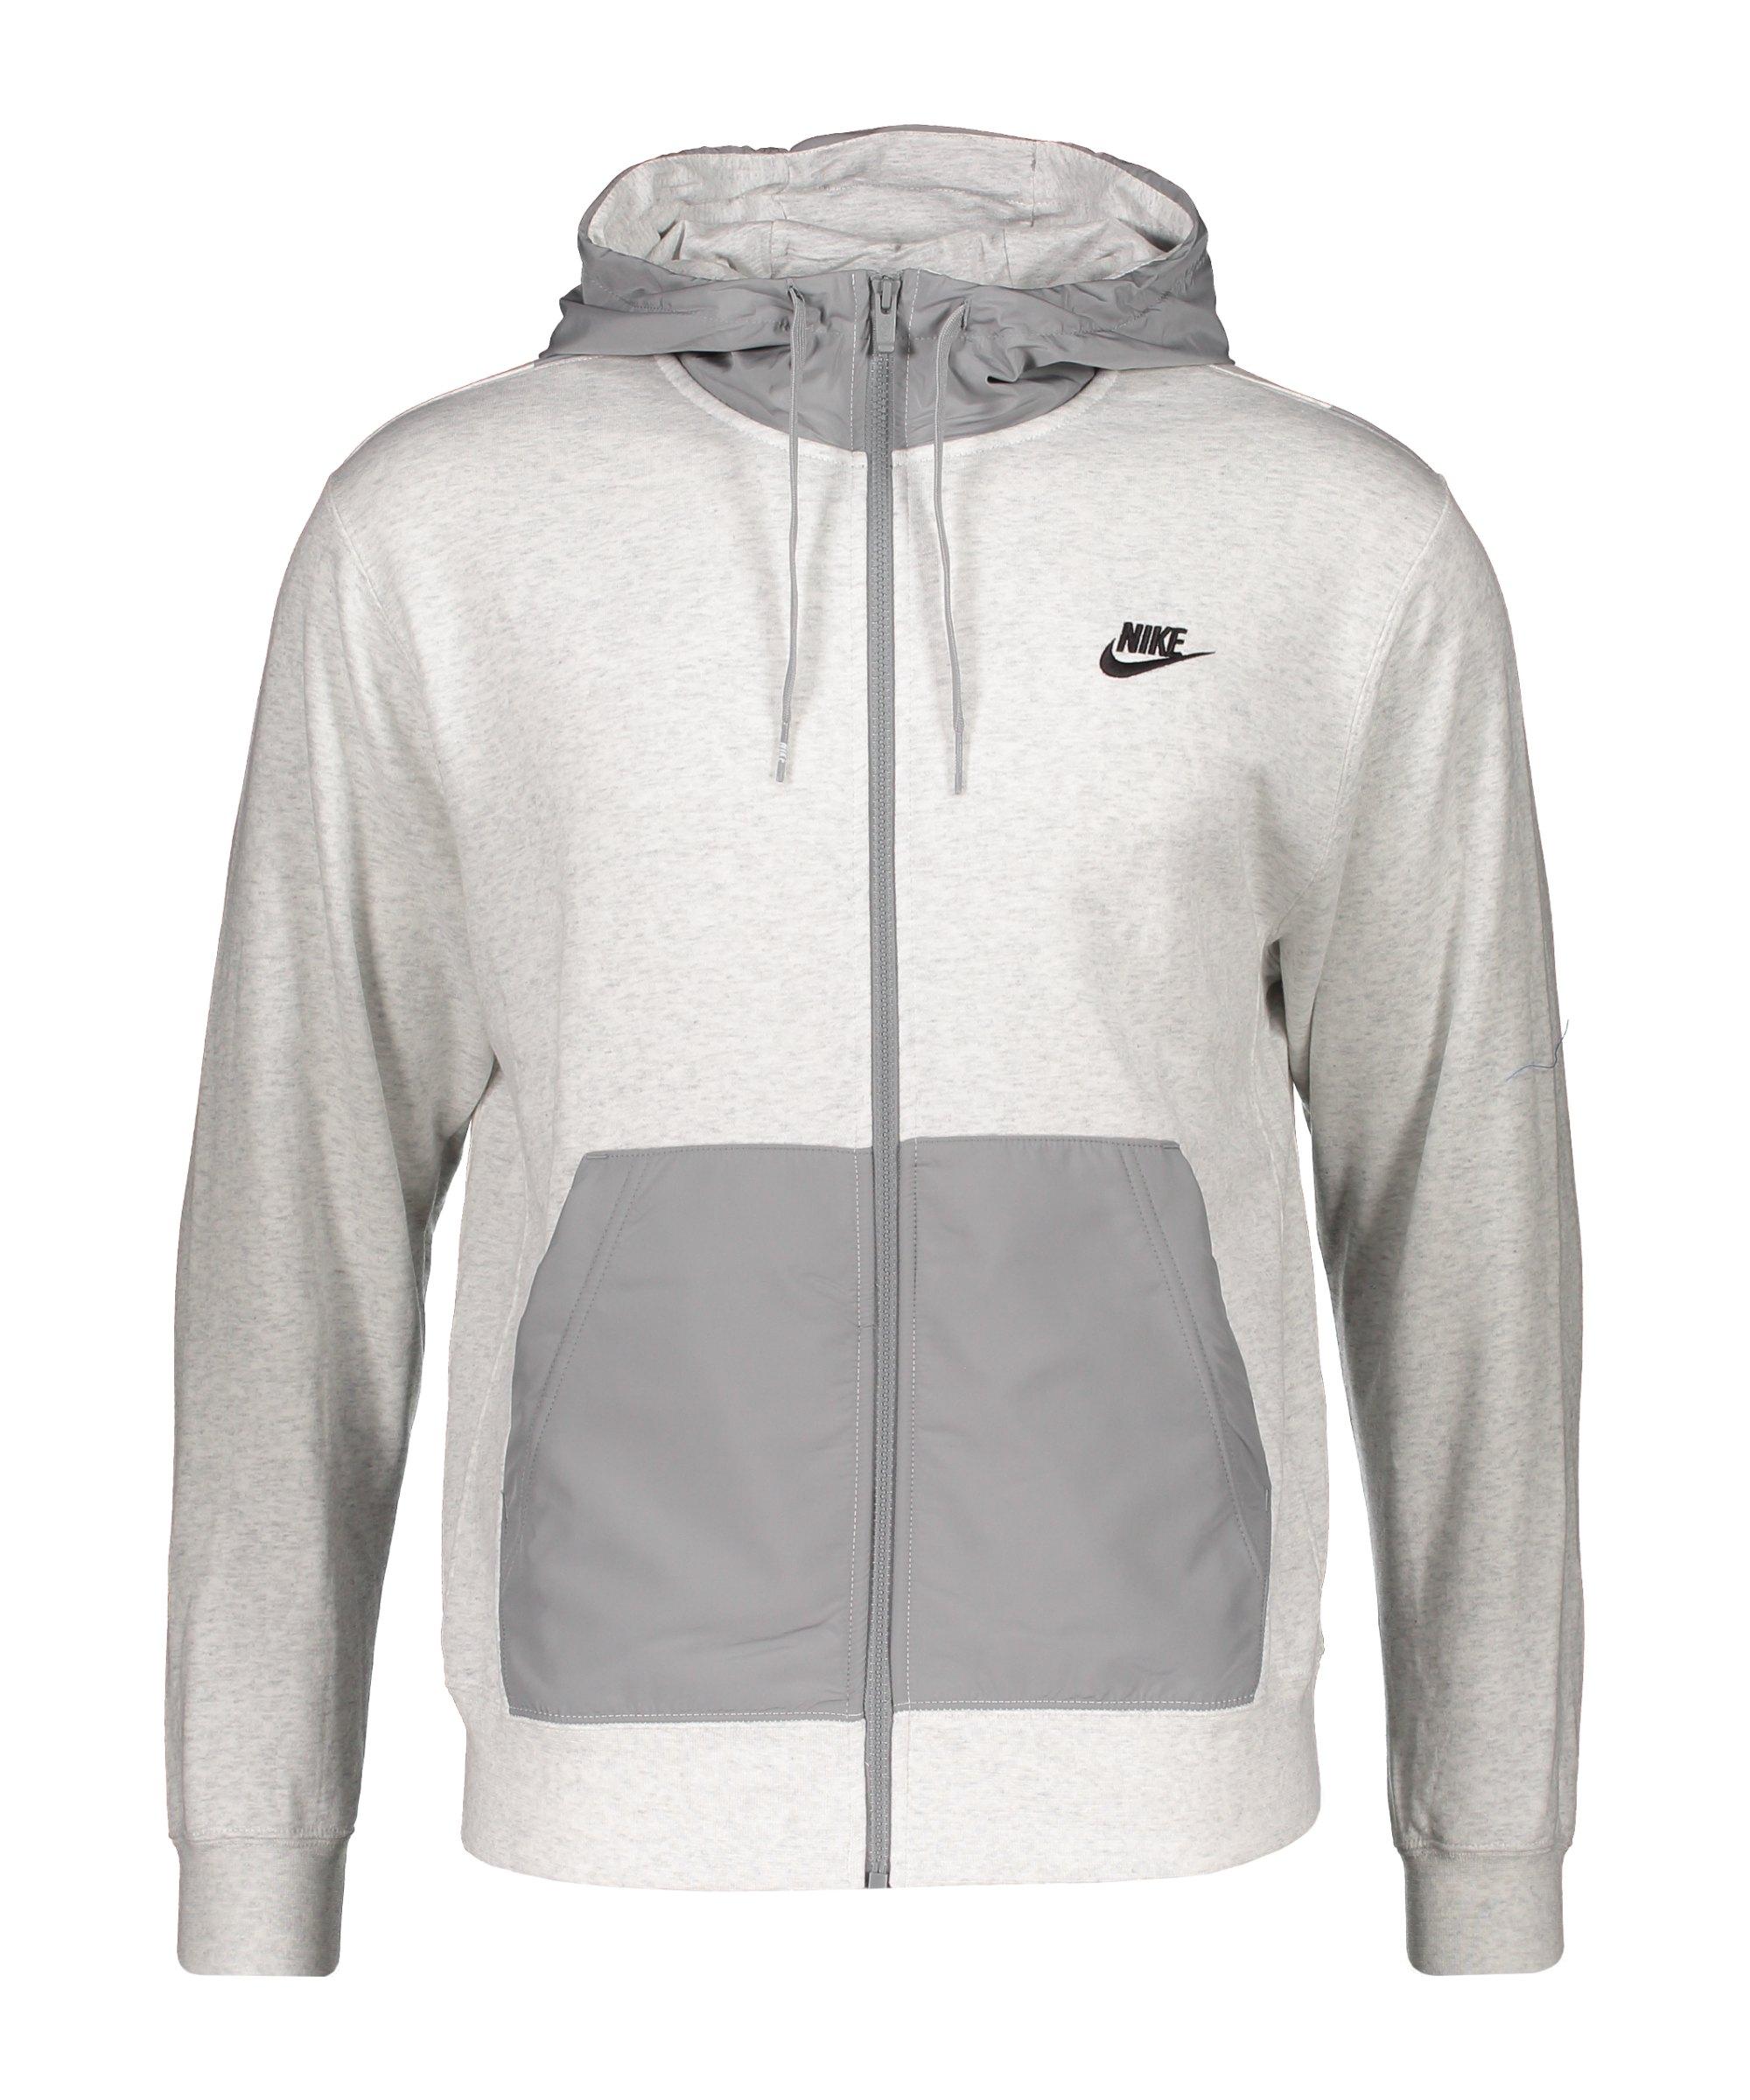 Nike Kapuzenjacke Weiss F051 - grau